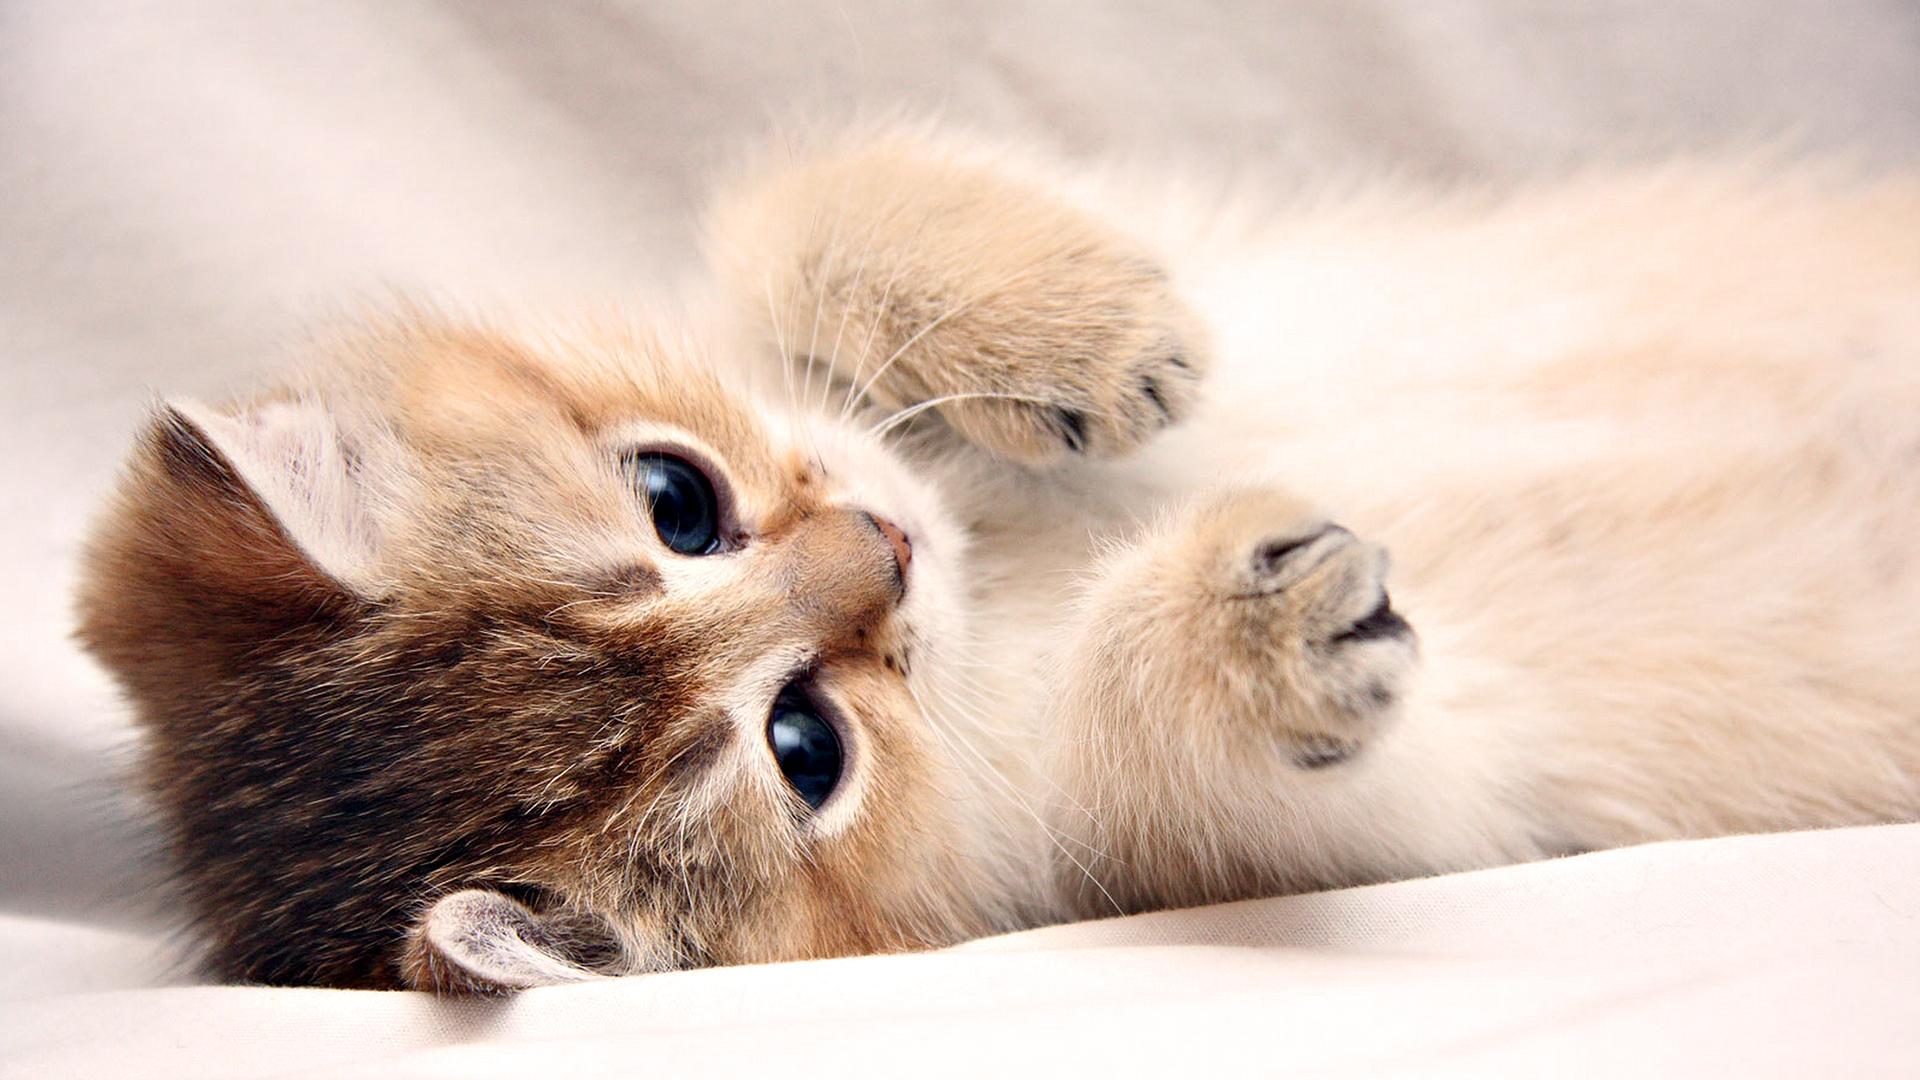 Kittens Karatasi La Kupamba Ukuta Entitled Adorable